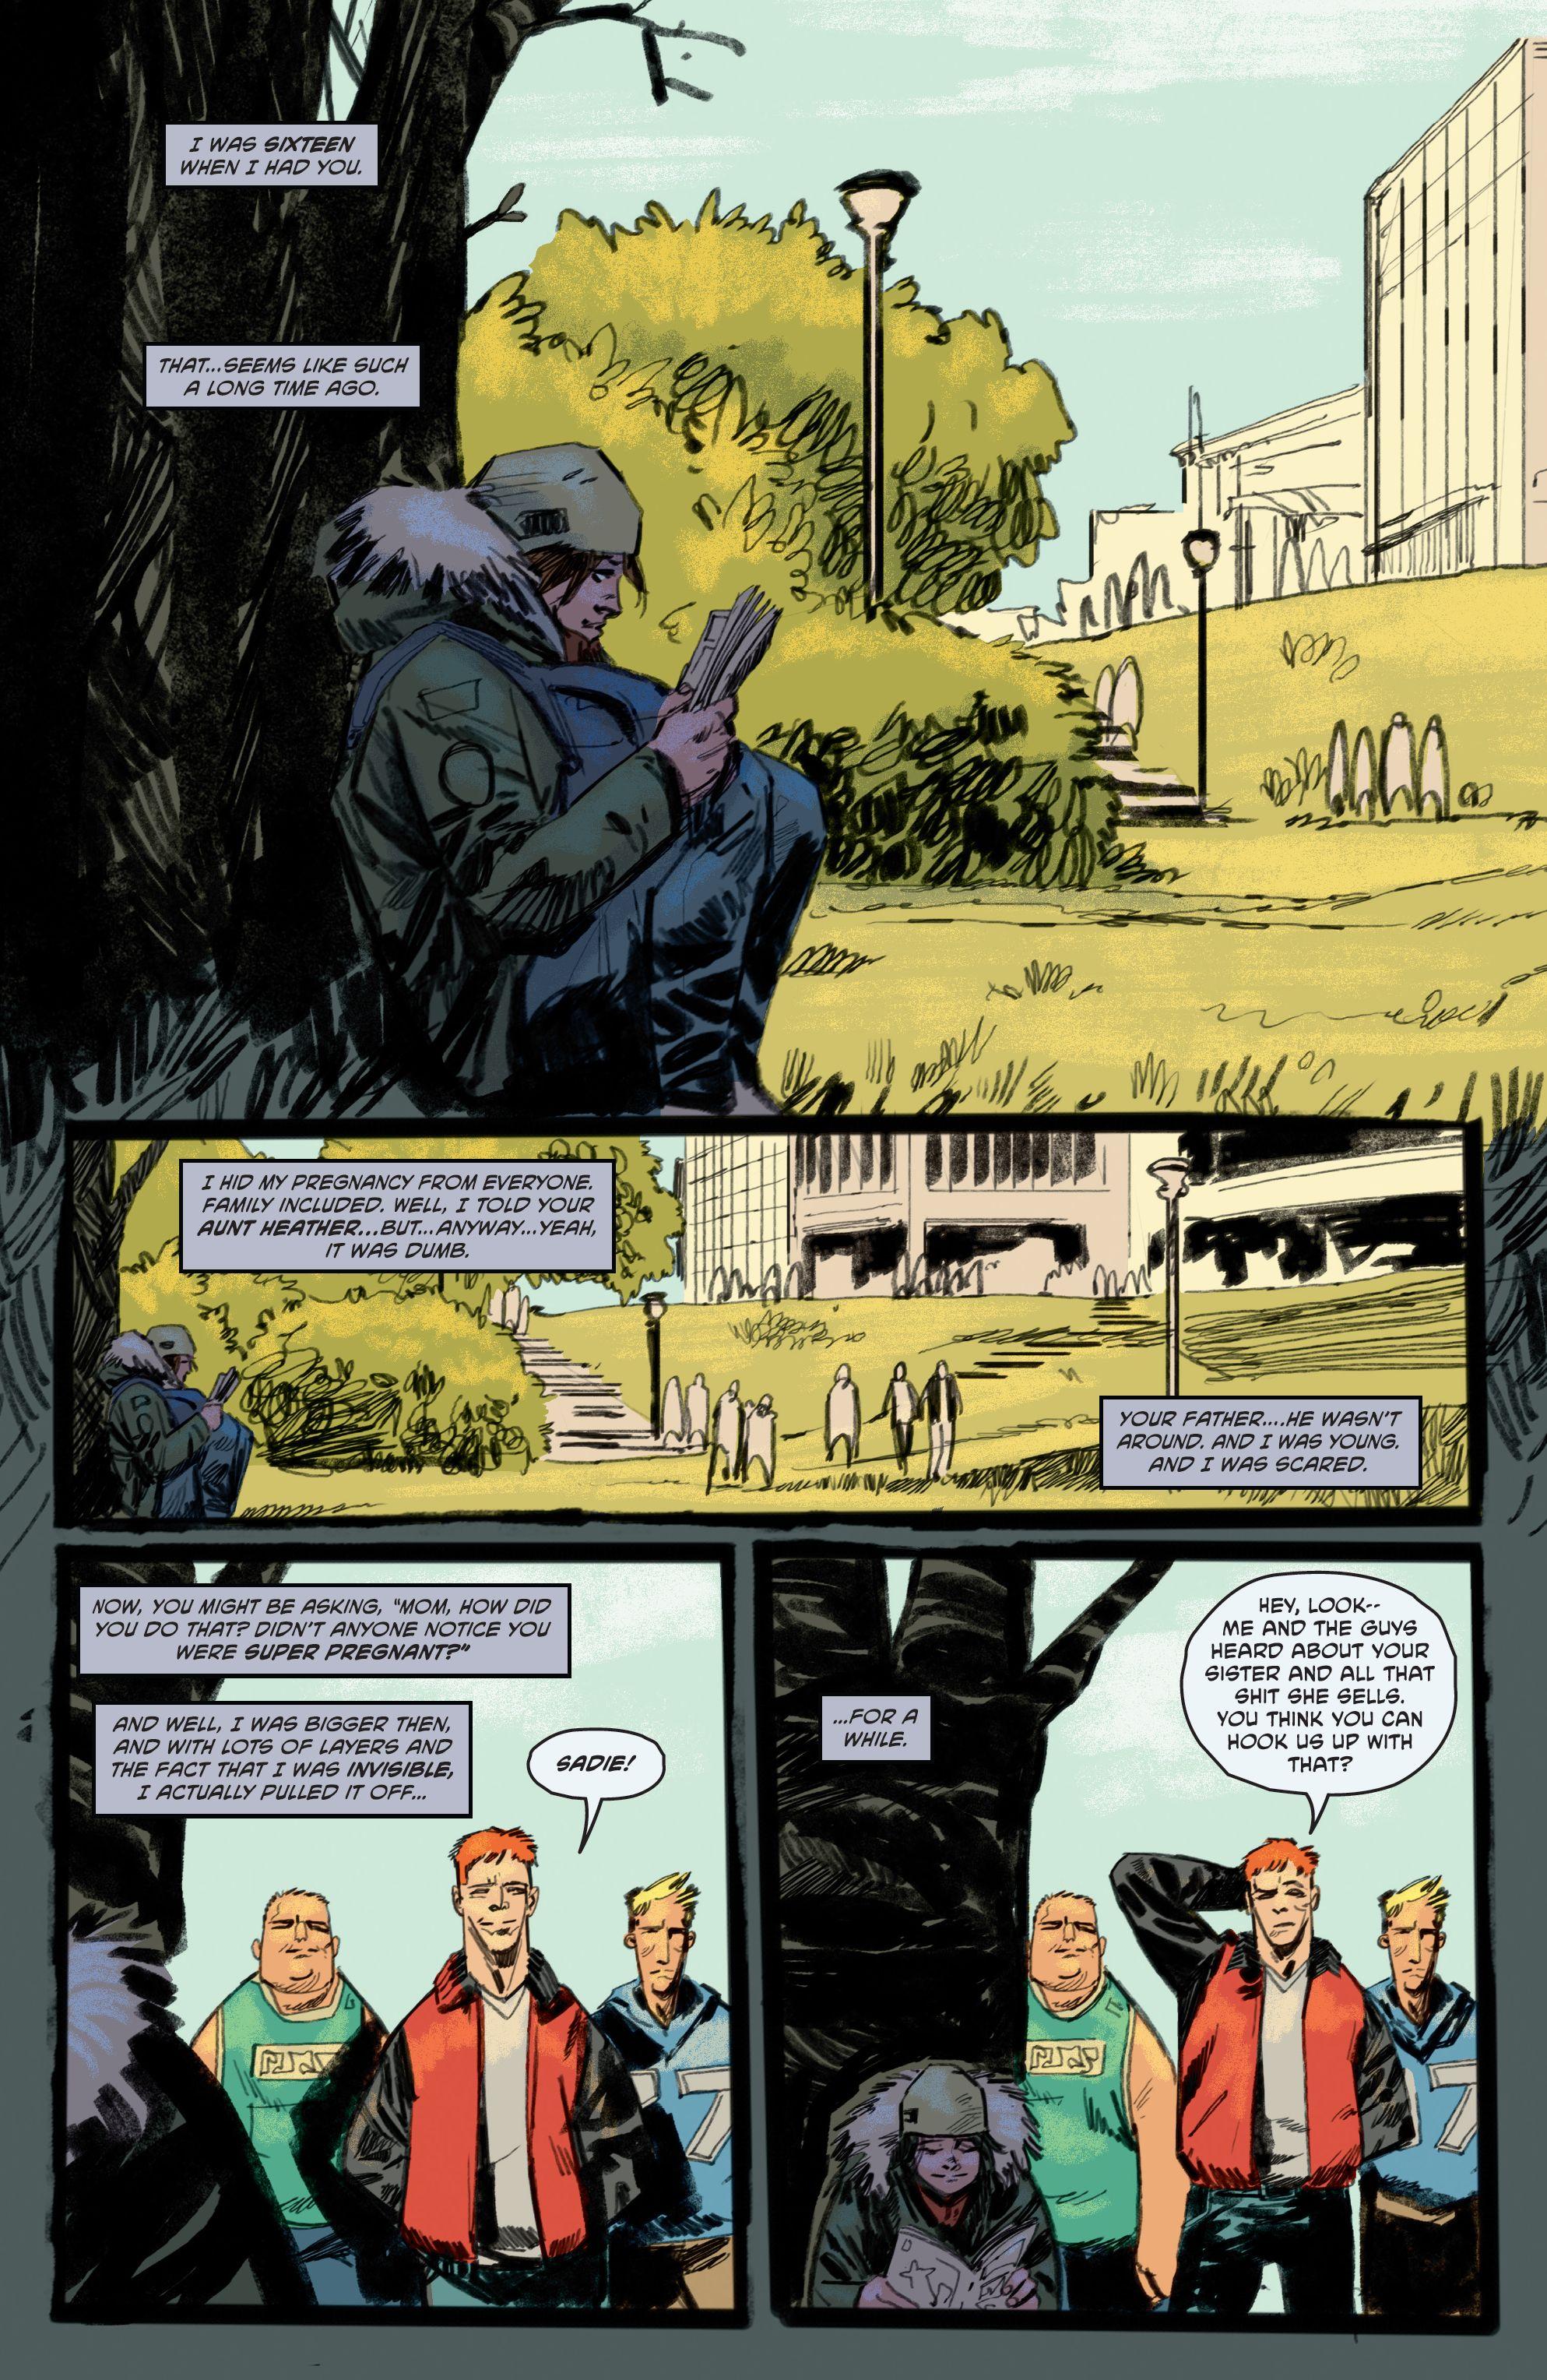 Read online Babyteeth comic -  Issue #1 - 6